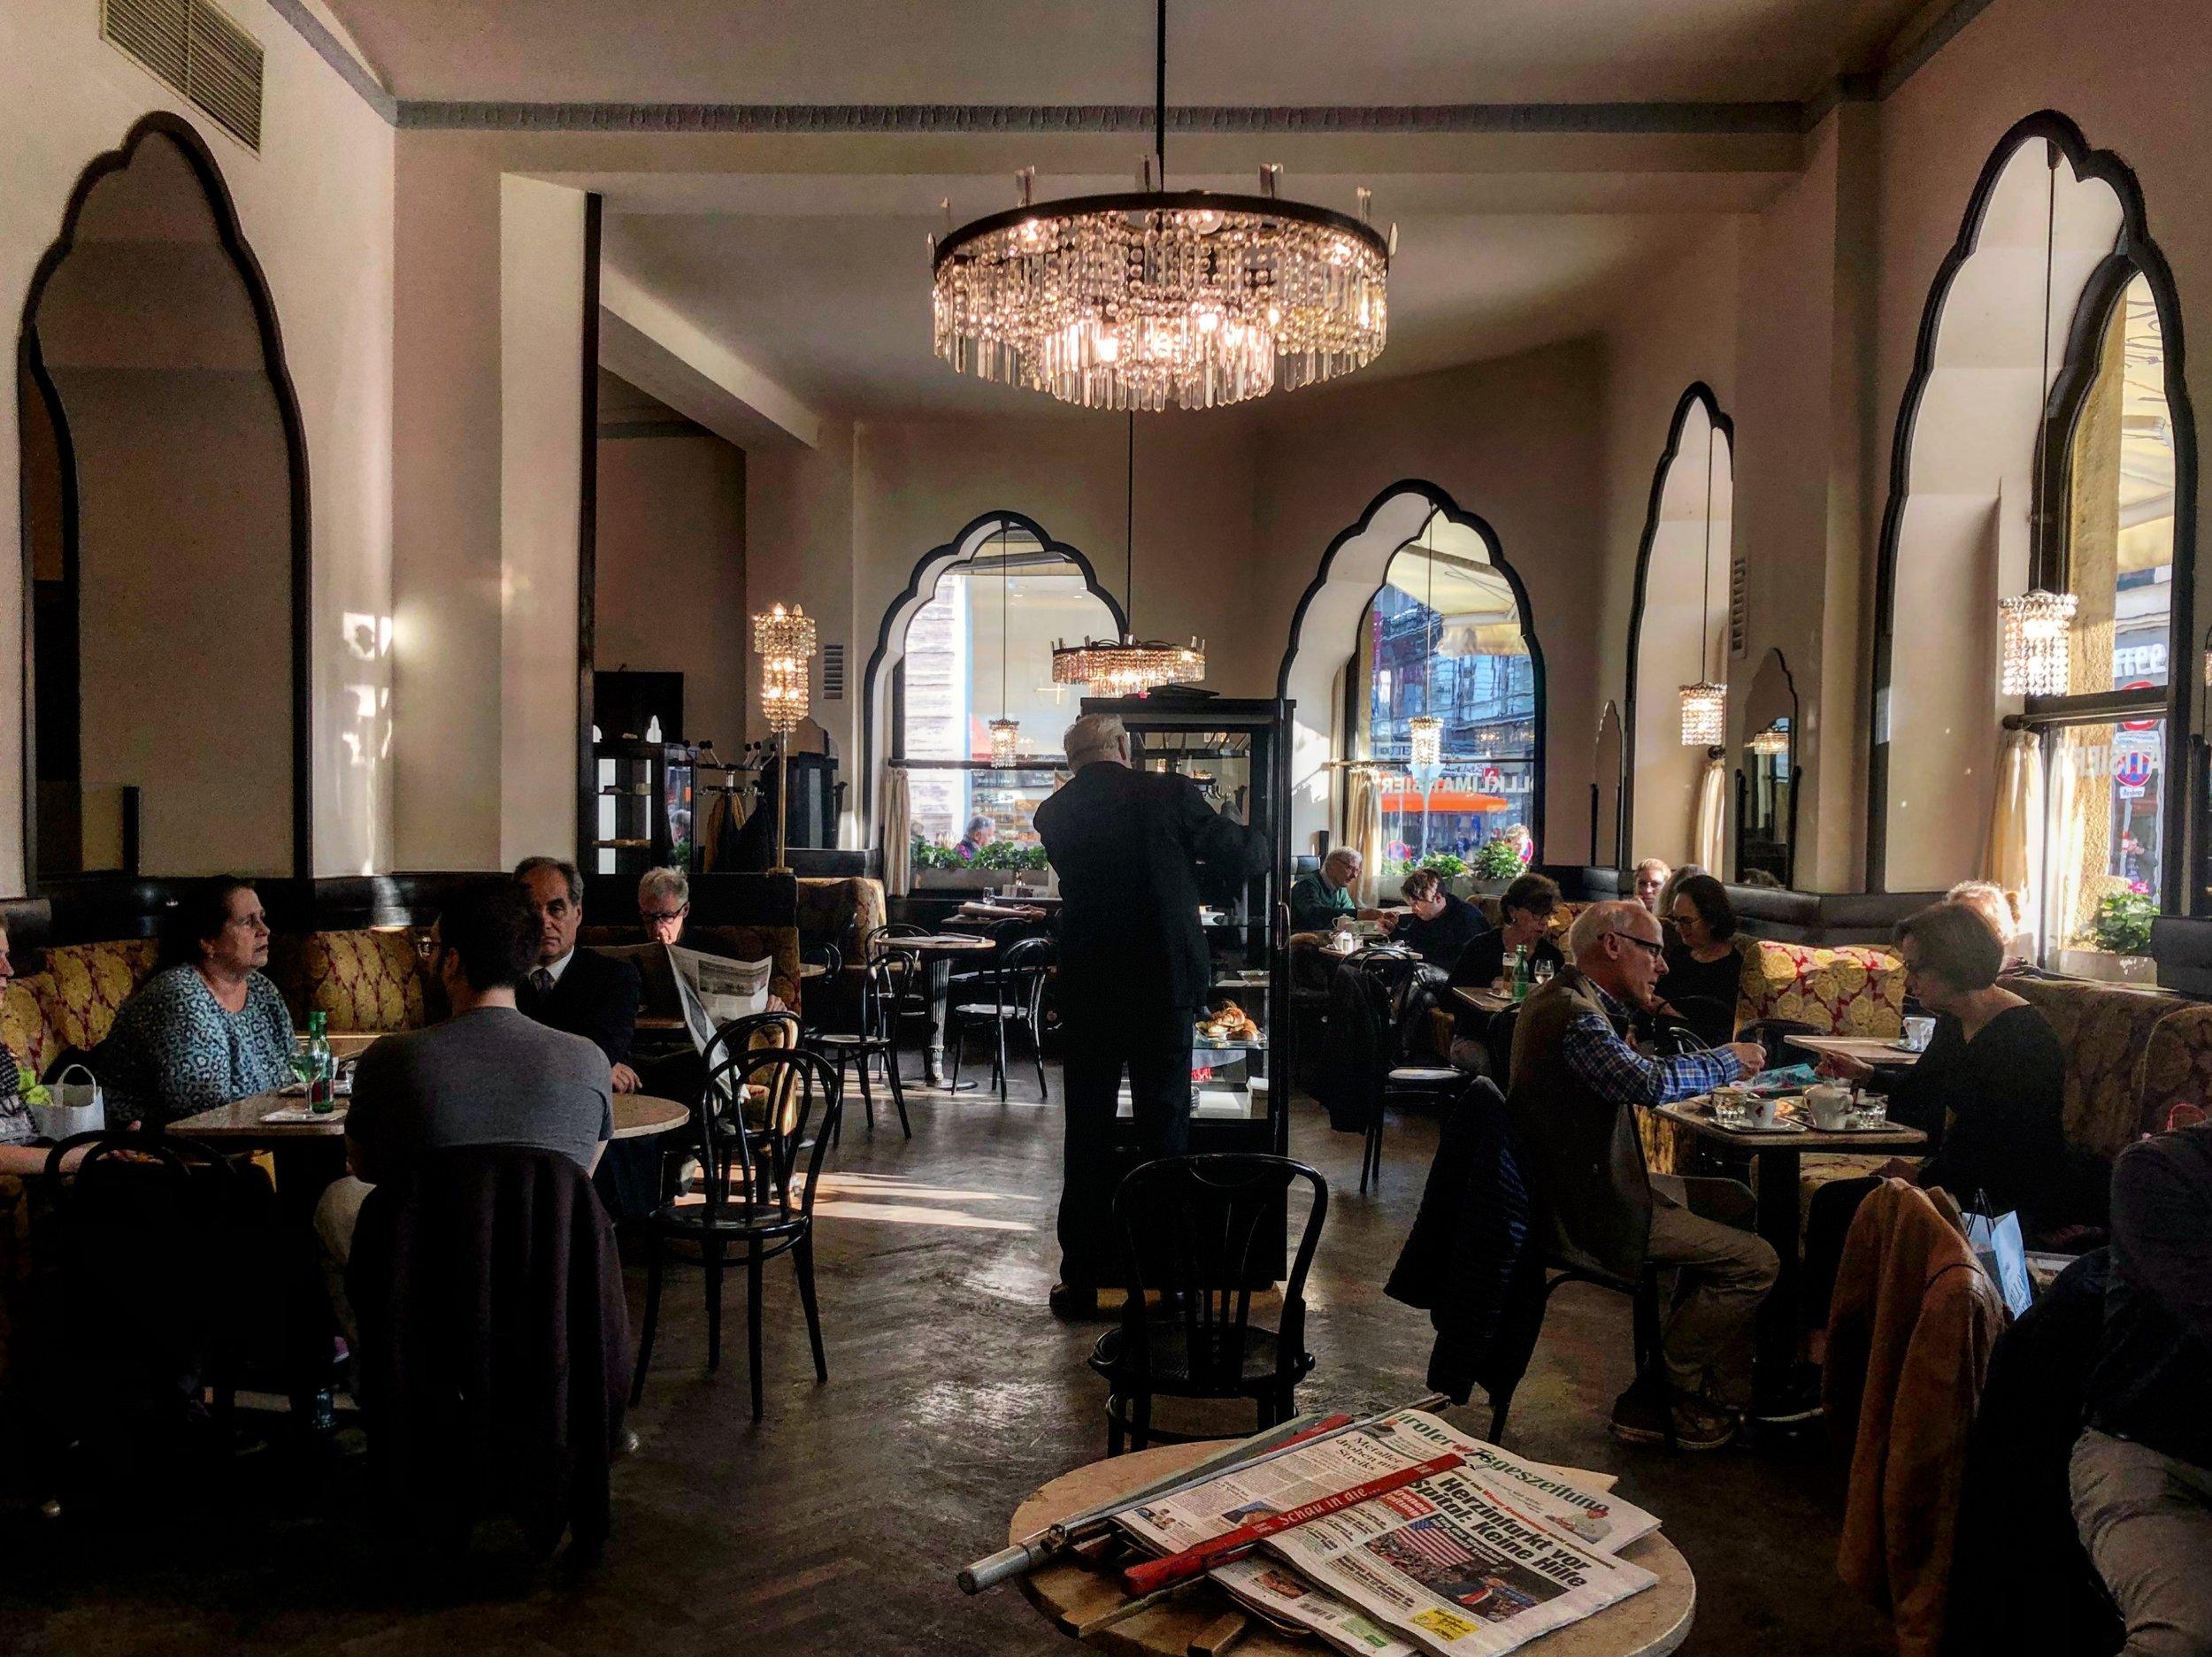 Cafe Tirolerhof, Vienna